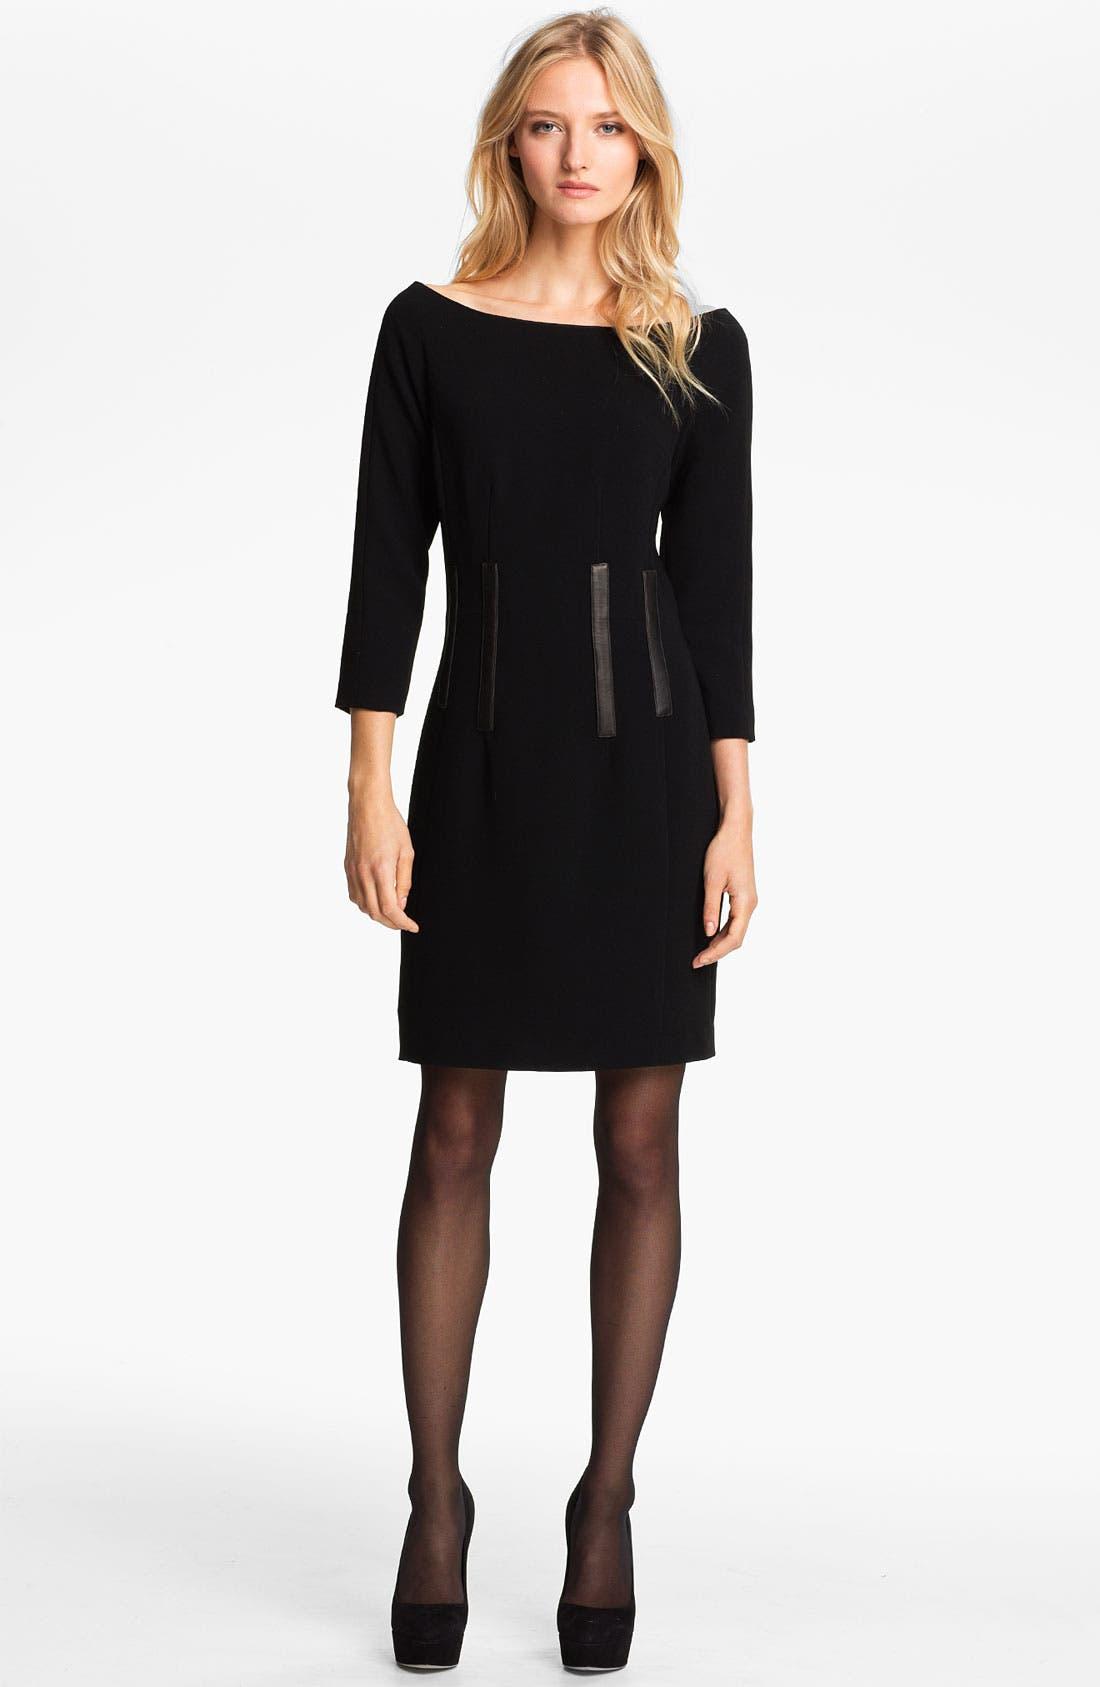 Alternate Image 1 Selected - rag & bone 'Imogen' Leather Trim Dress